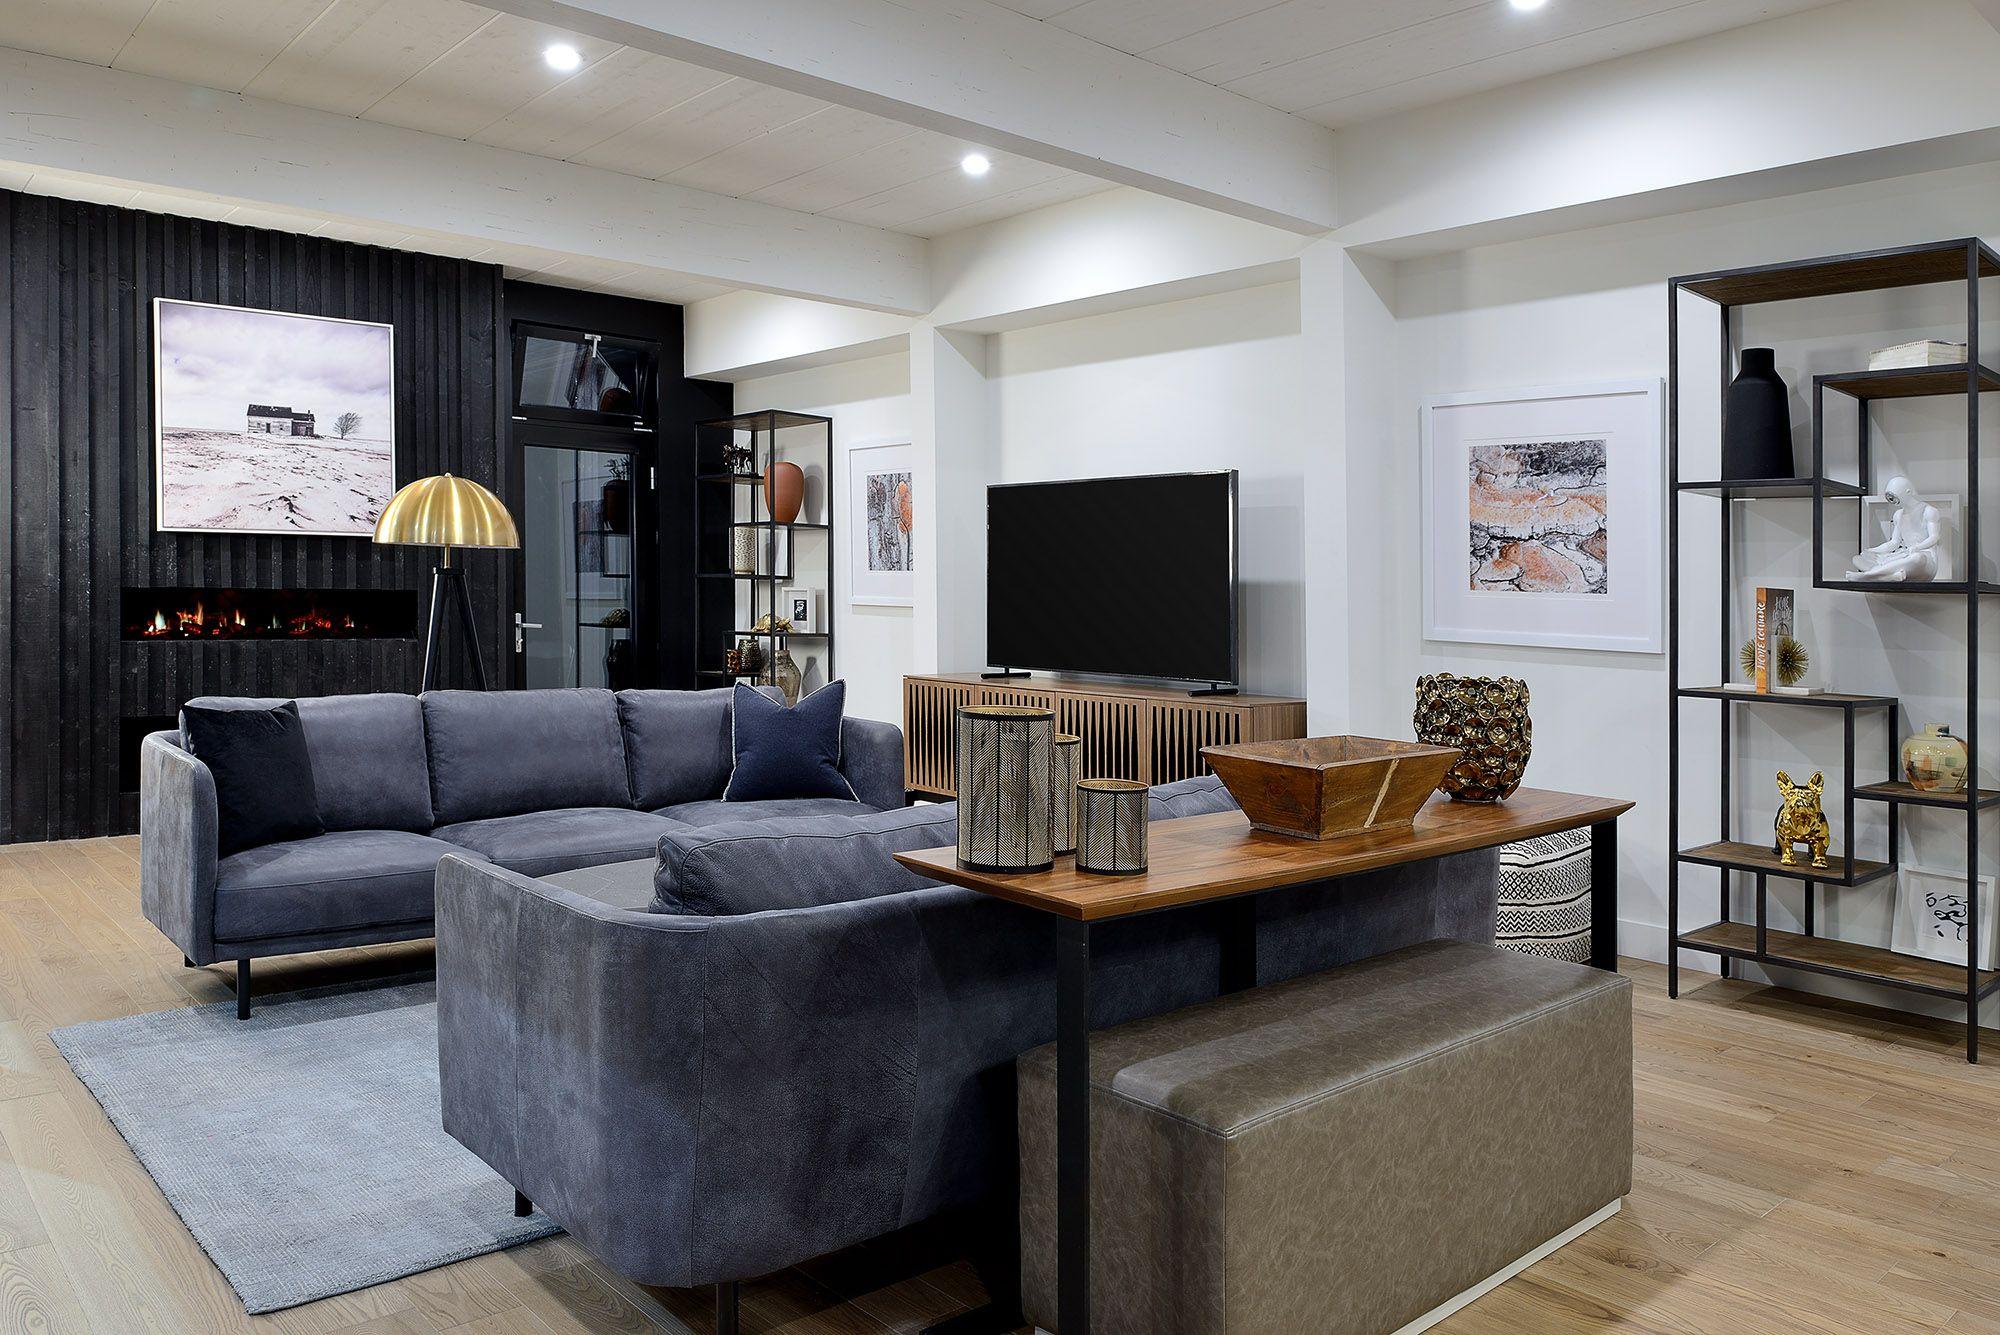 Home Staging By Bedford Brooks For The 2019 Toronto Home Show En 2020 Maison Usinee Maison Bonneville Maison